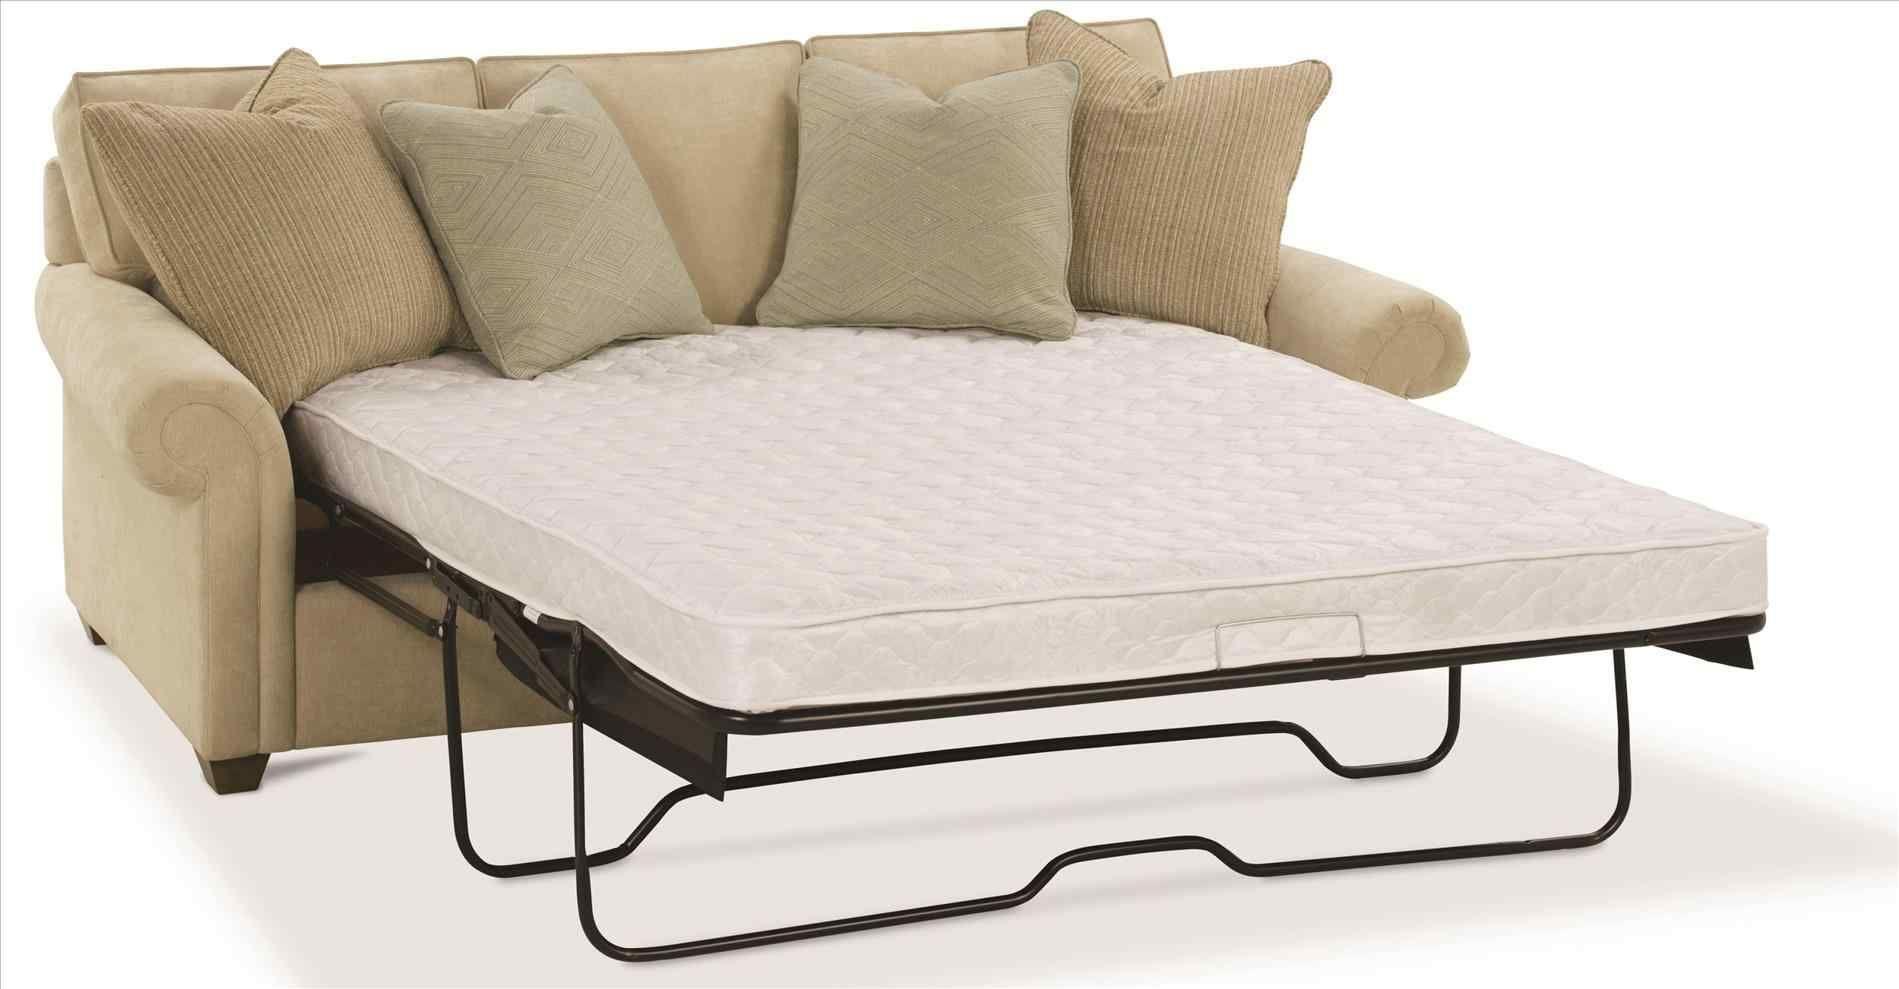 Coleman Sleeper Sofa With Blow Up Mattress Twin Double High Enjoy